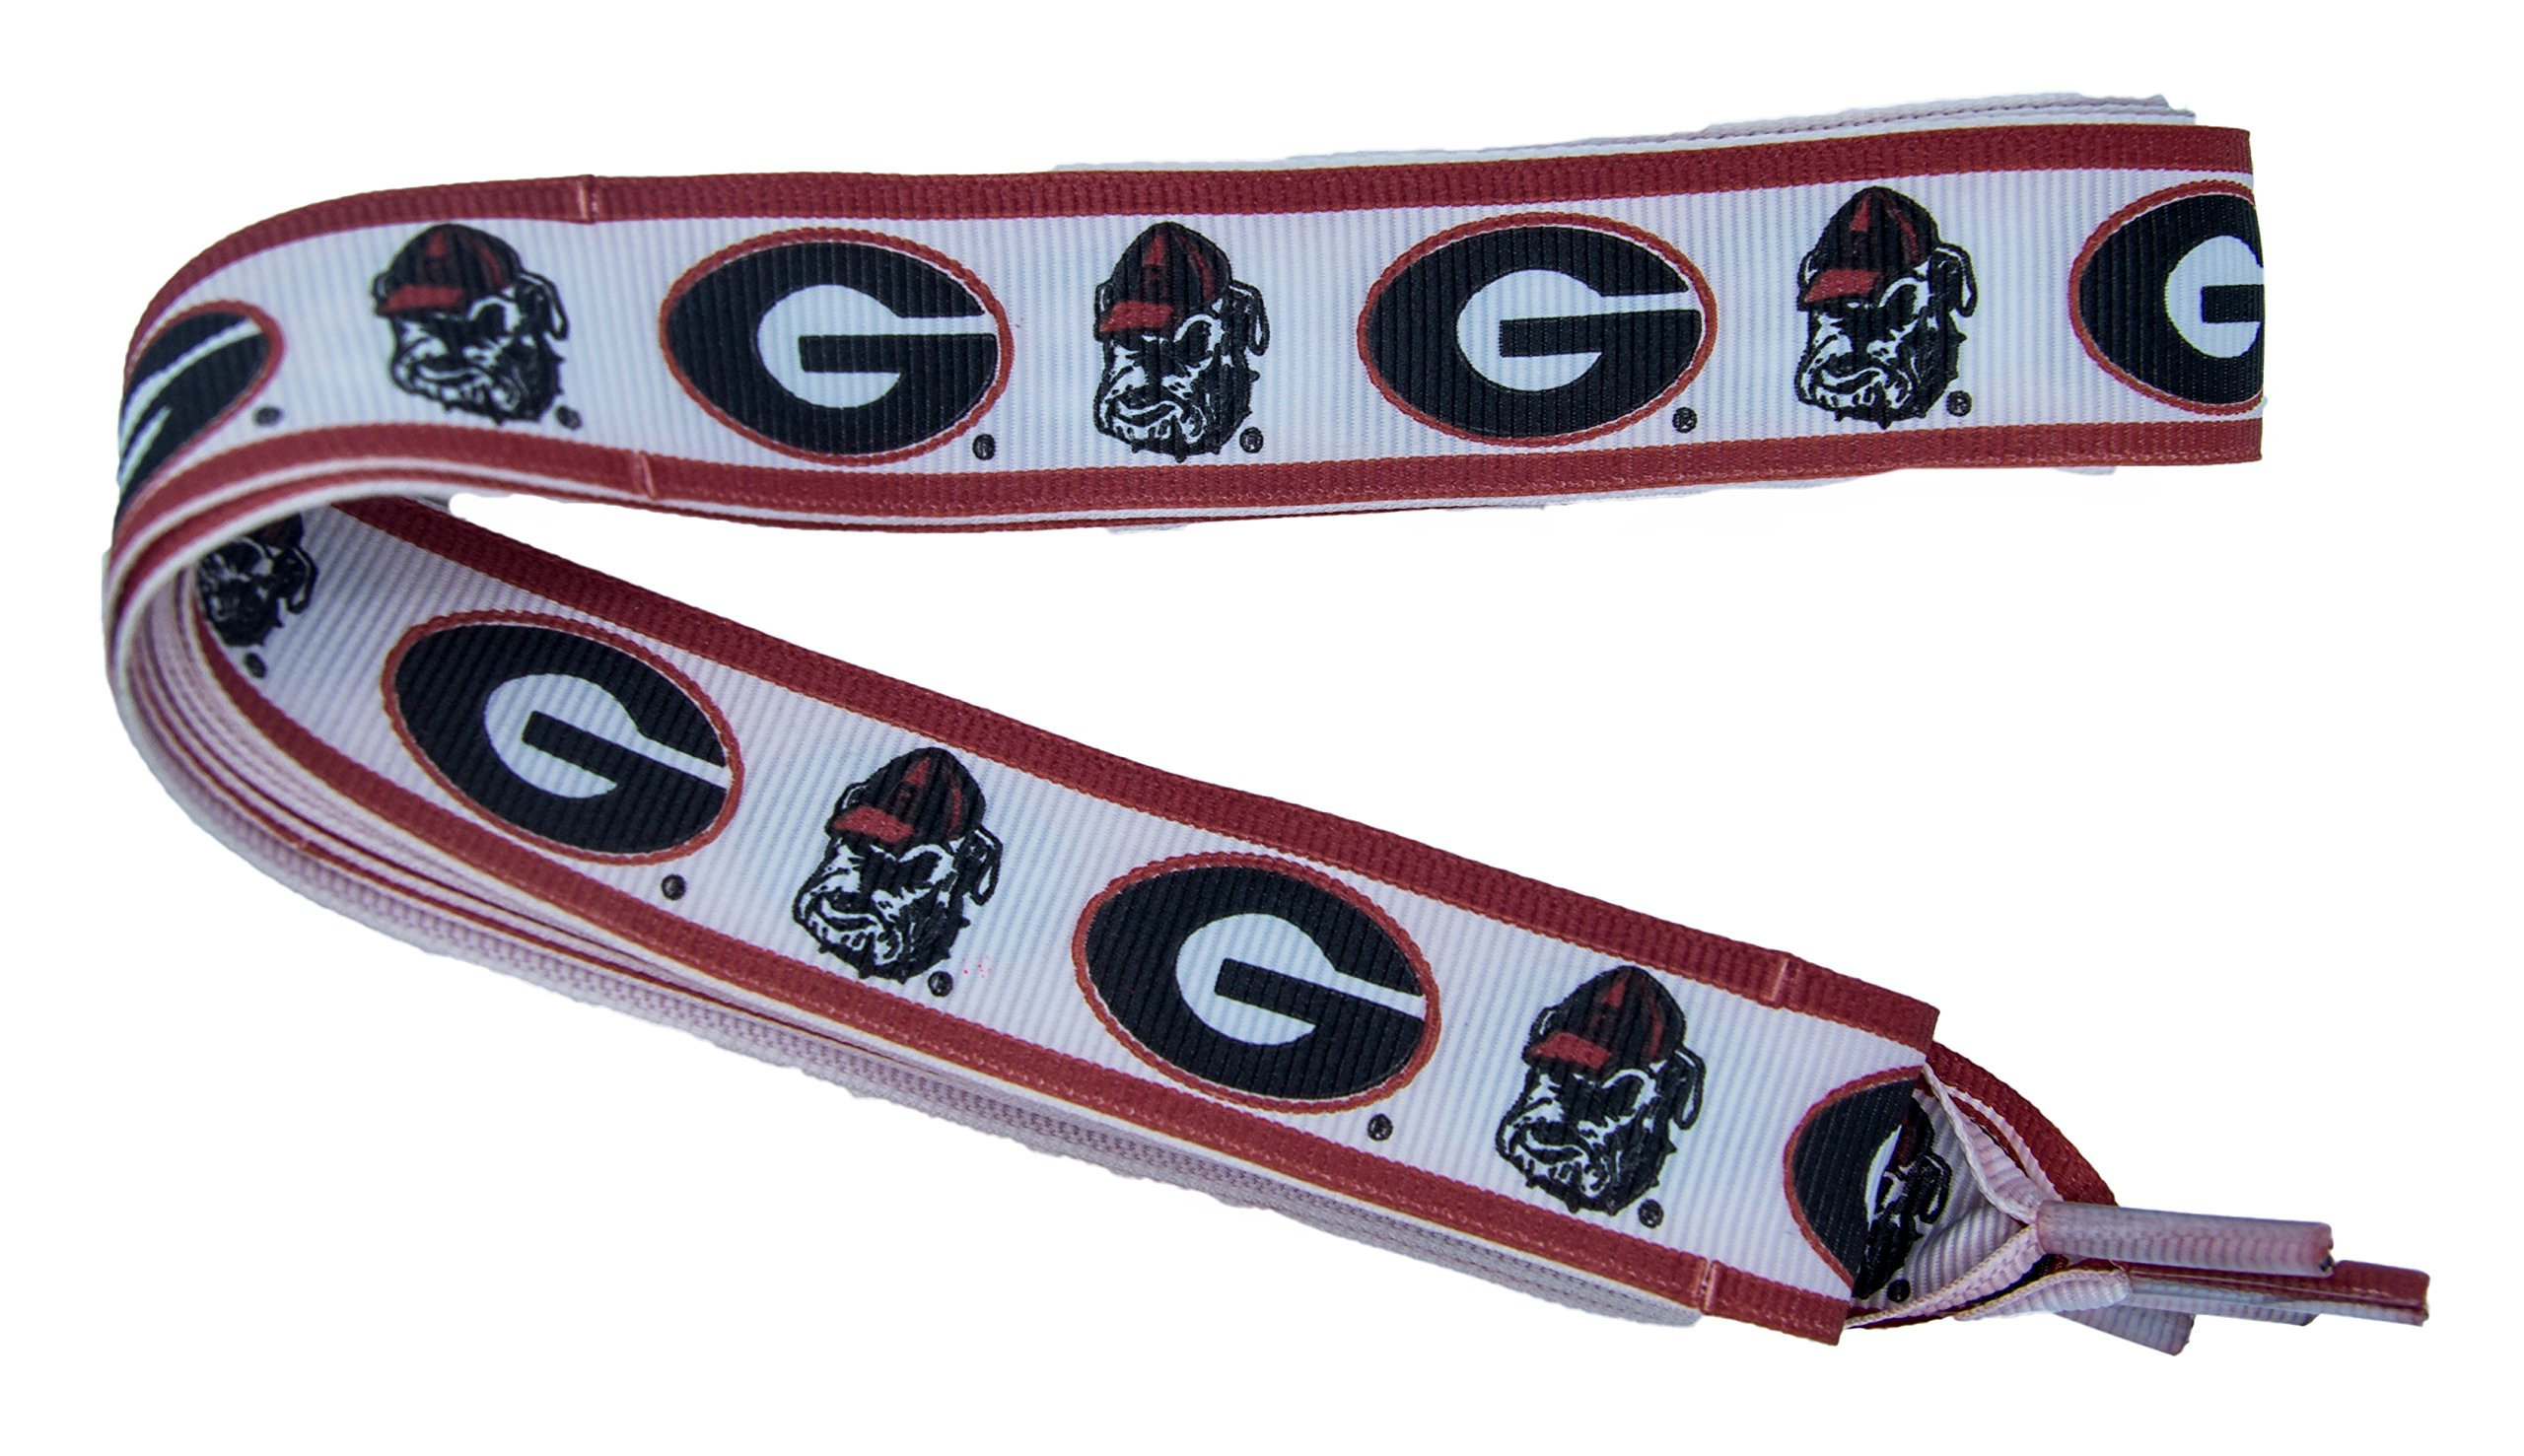 NCAA Georgia Bulldogs Shoelaces, Red/Black, One Size